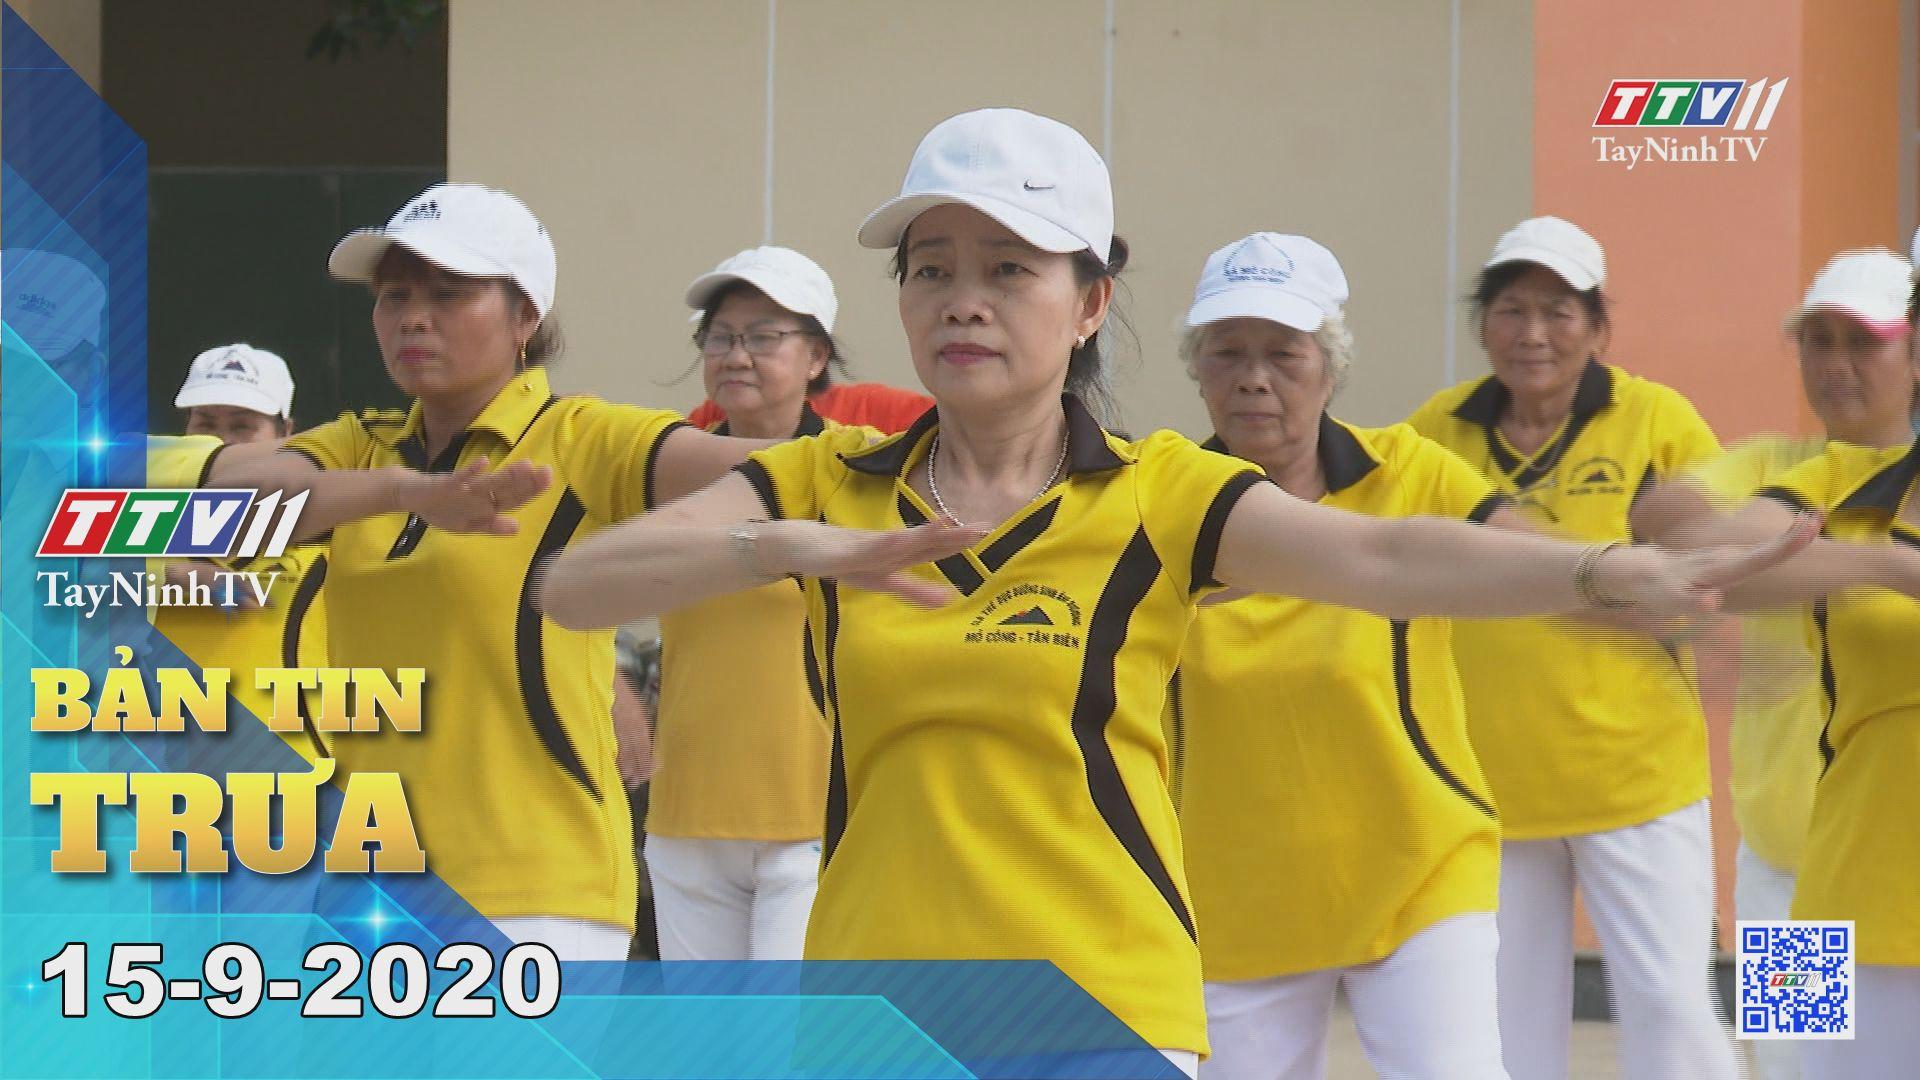 Bản tin trưa 15-9-2020 | Tin tức hôm nay | TayNinhTV